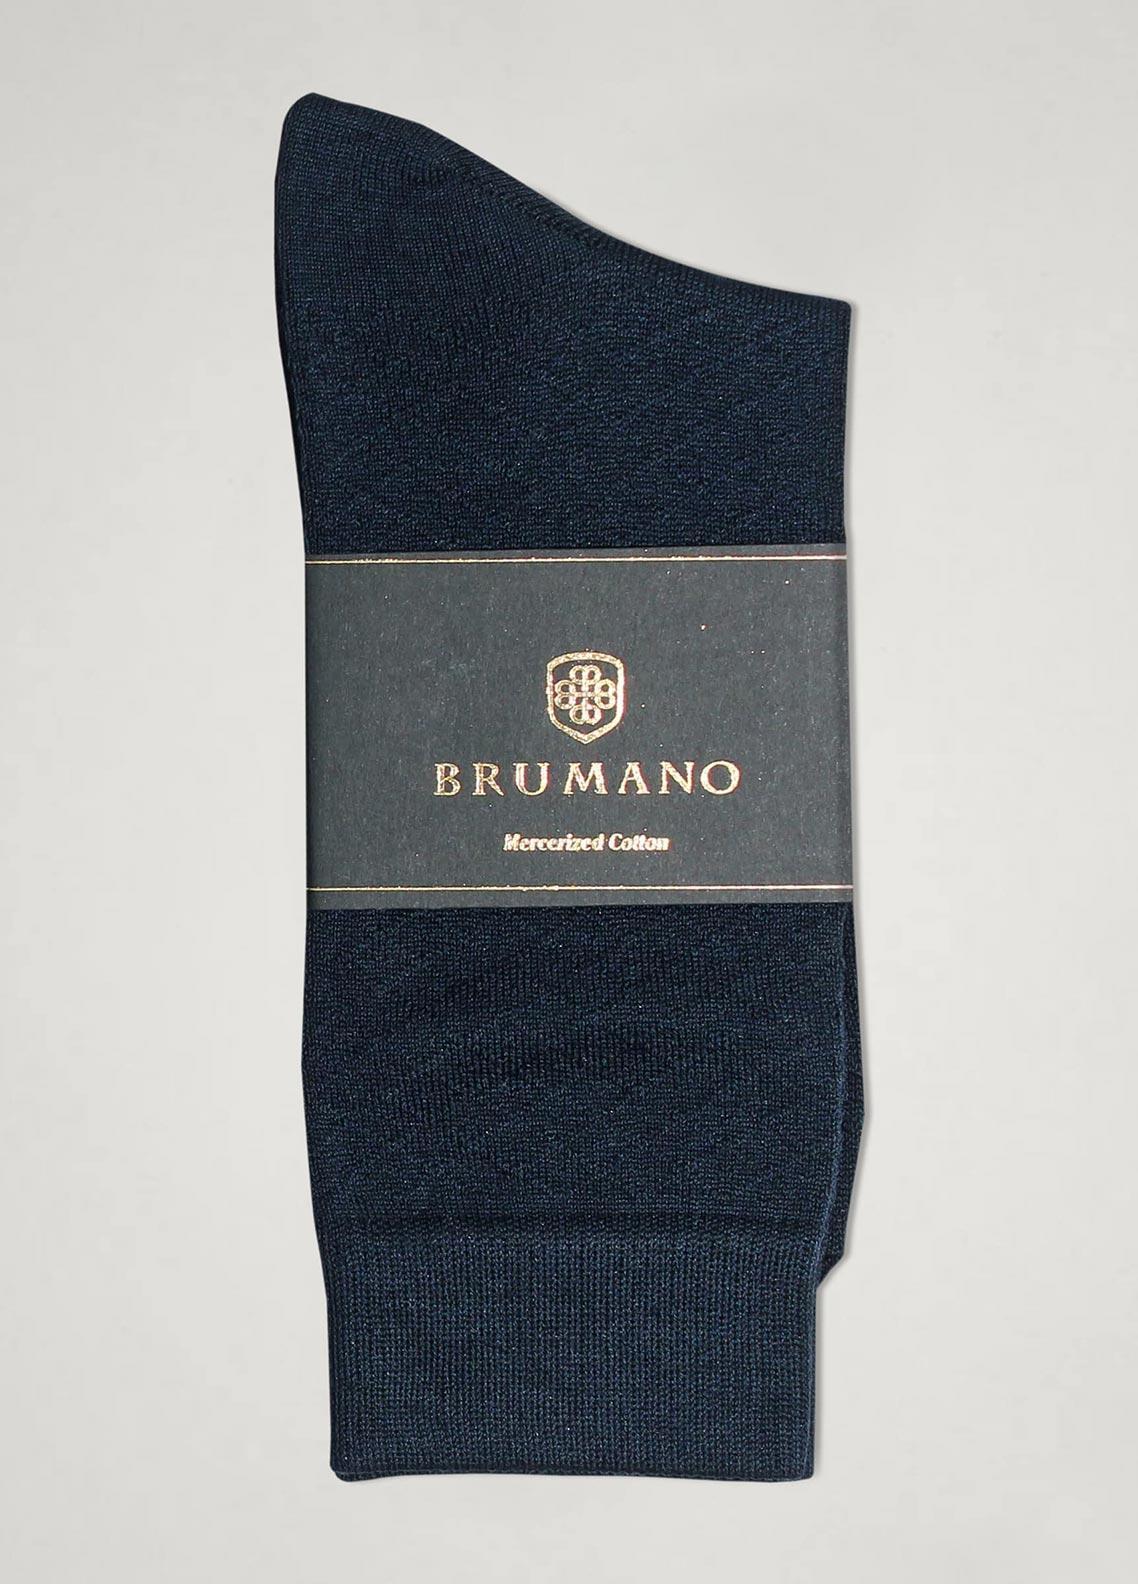 Brumano Cotton Socks SKS-004